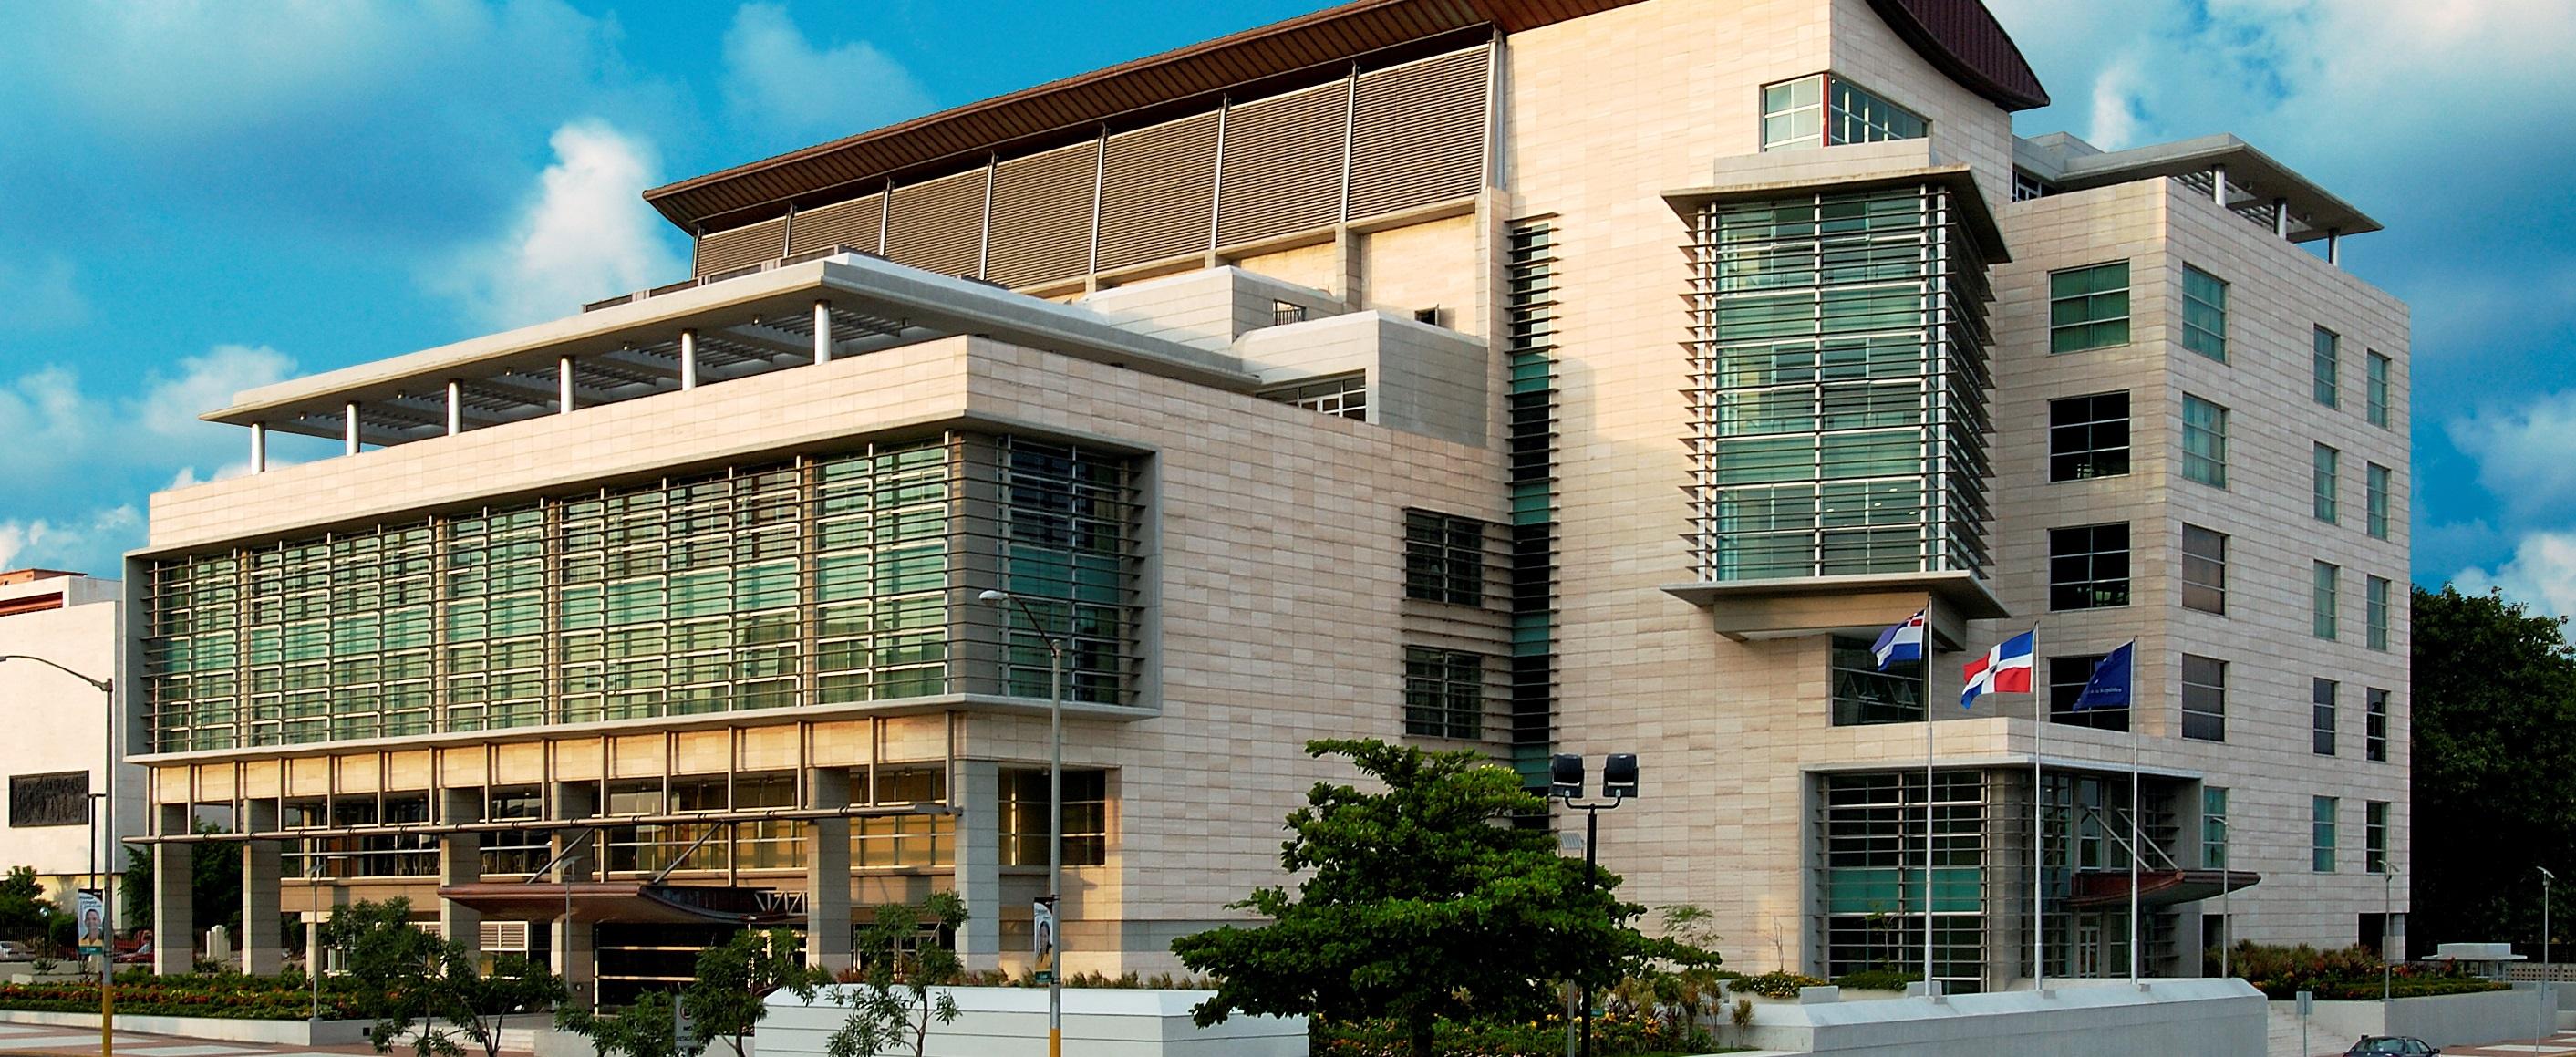 Consejo del Poder Judicial destituye jueza por faltas graves